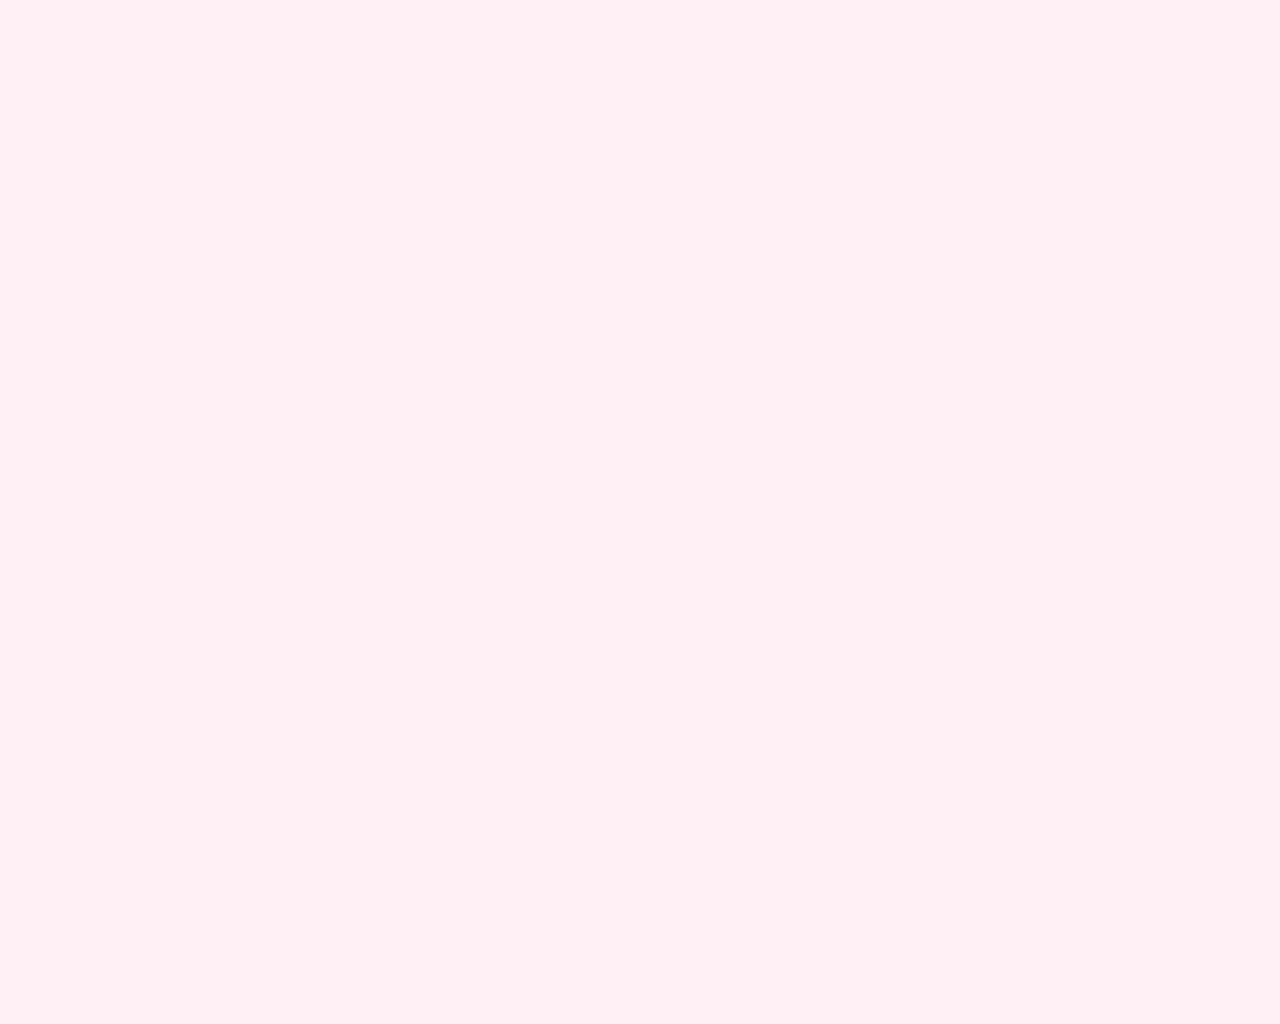 1280x1024 Lavender Blush Solid Color Background